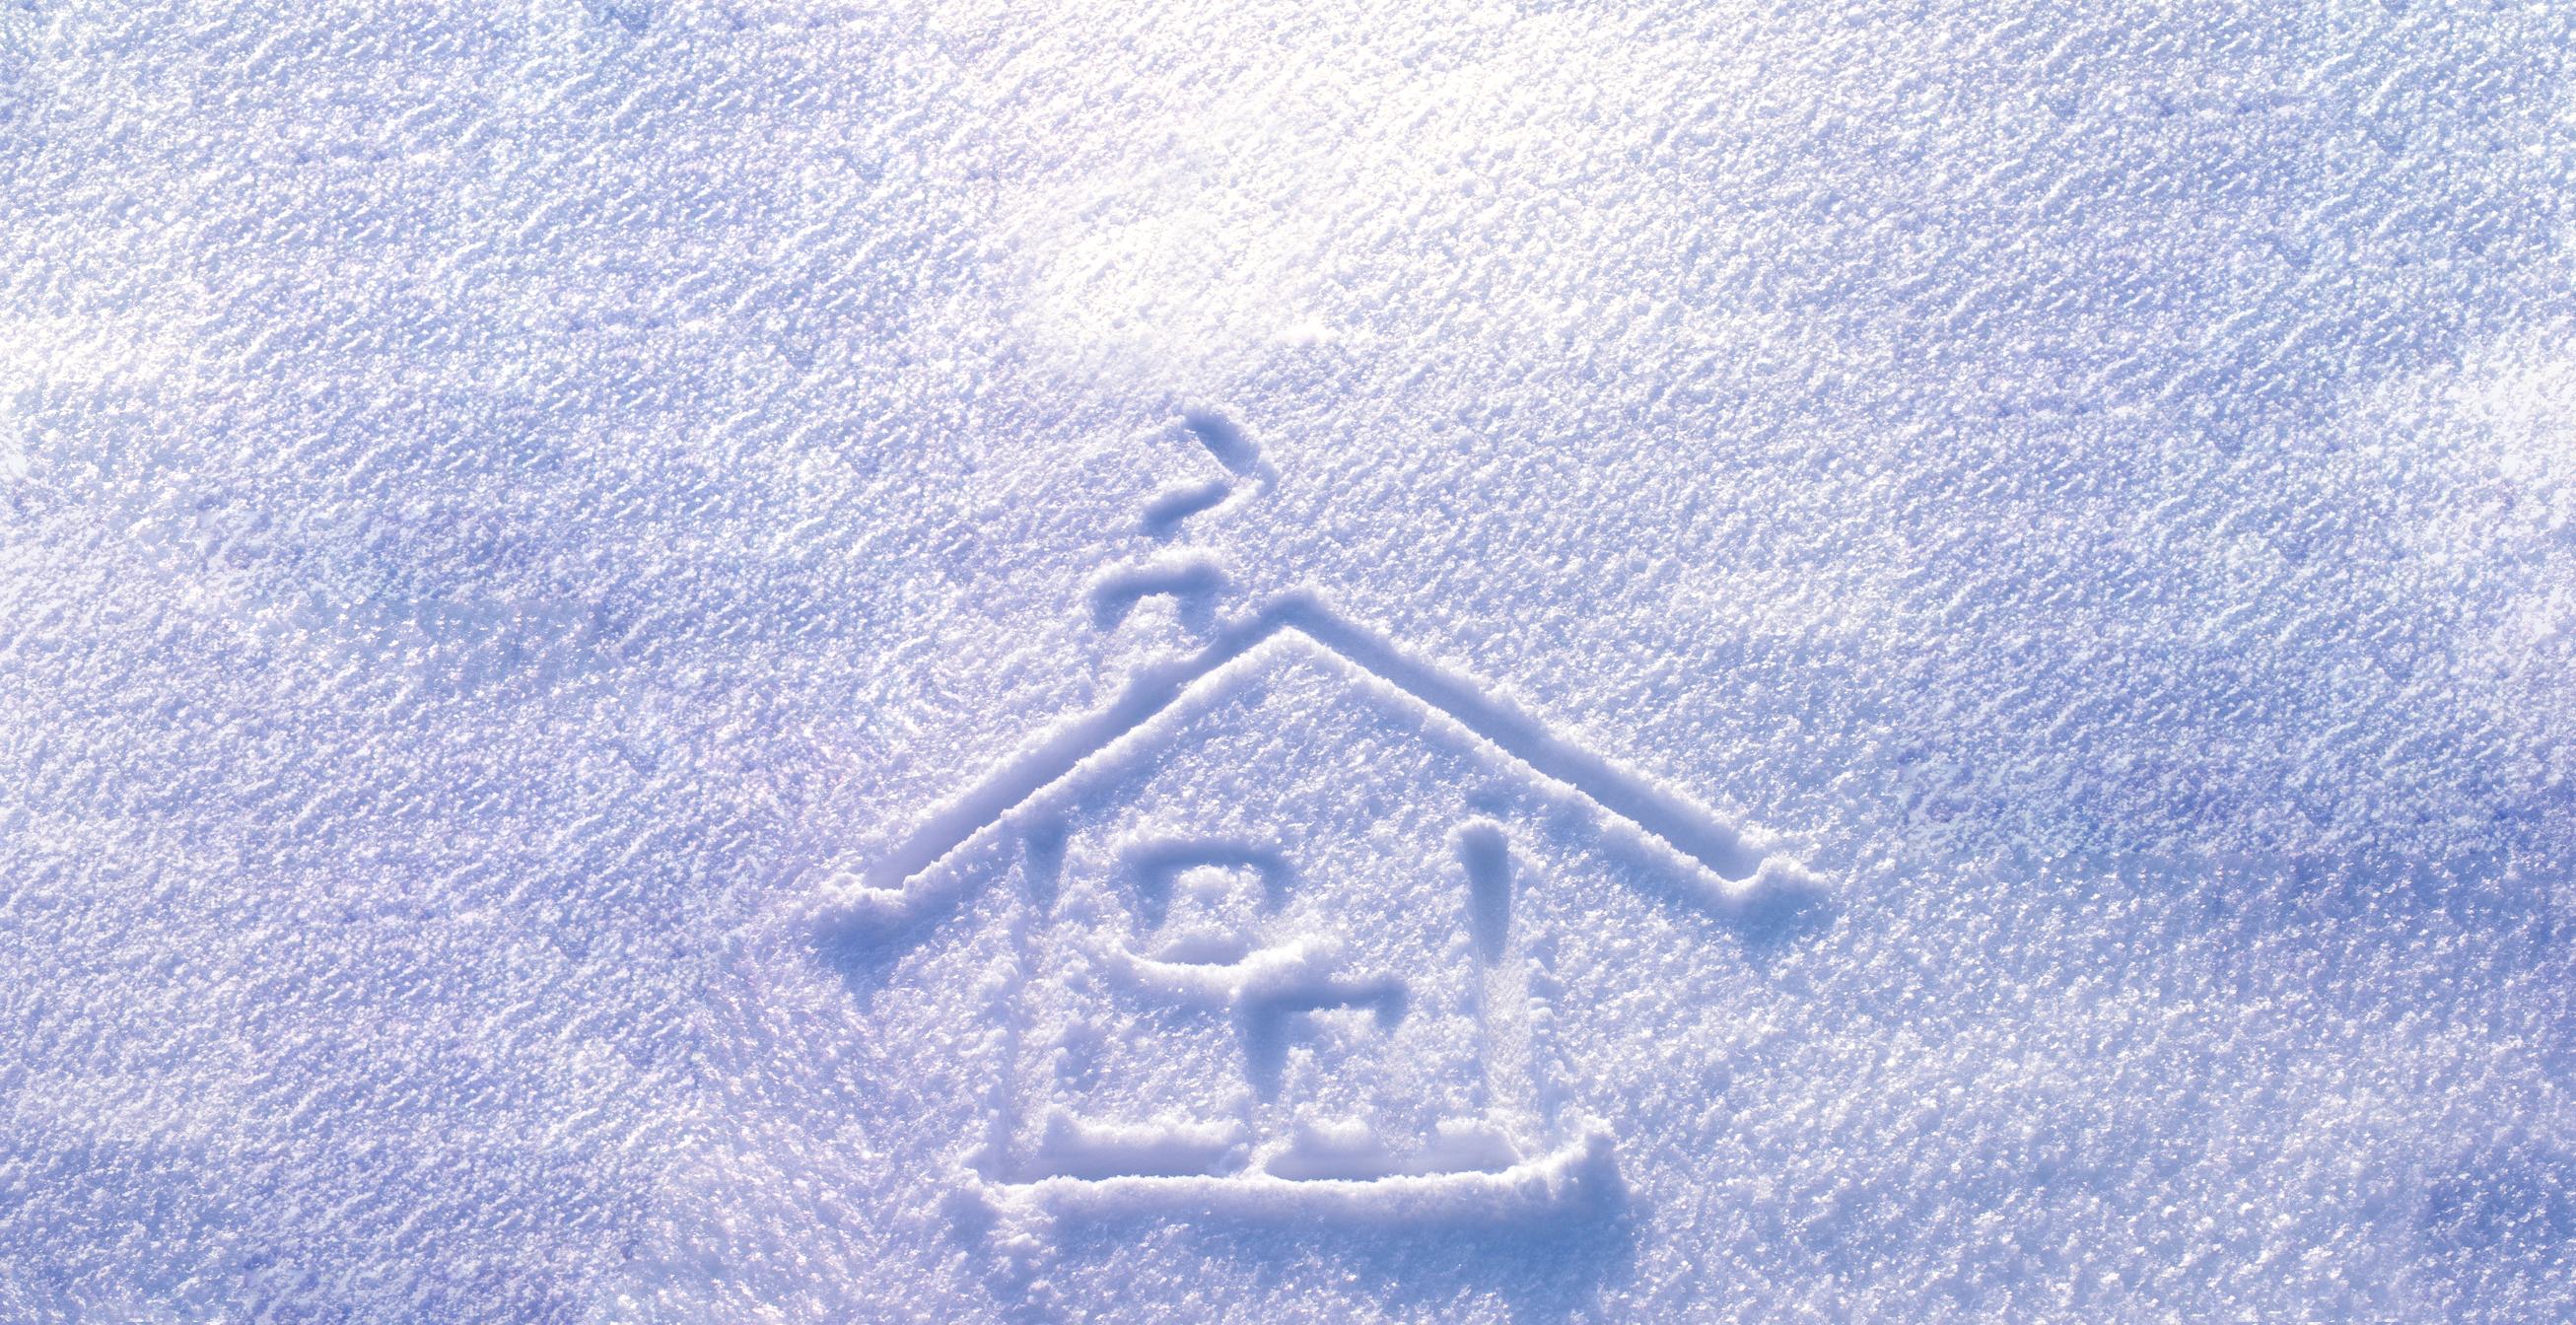 house_drawninsnowlarger